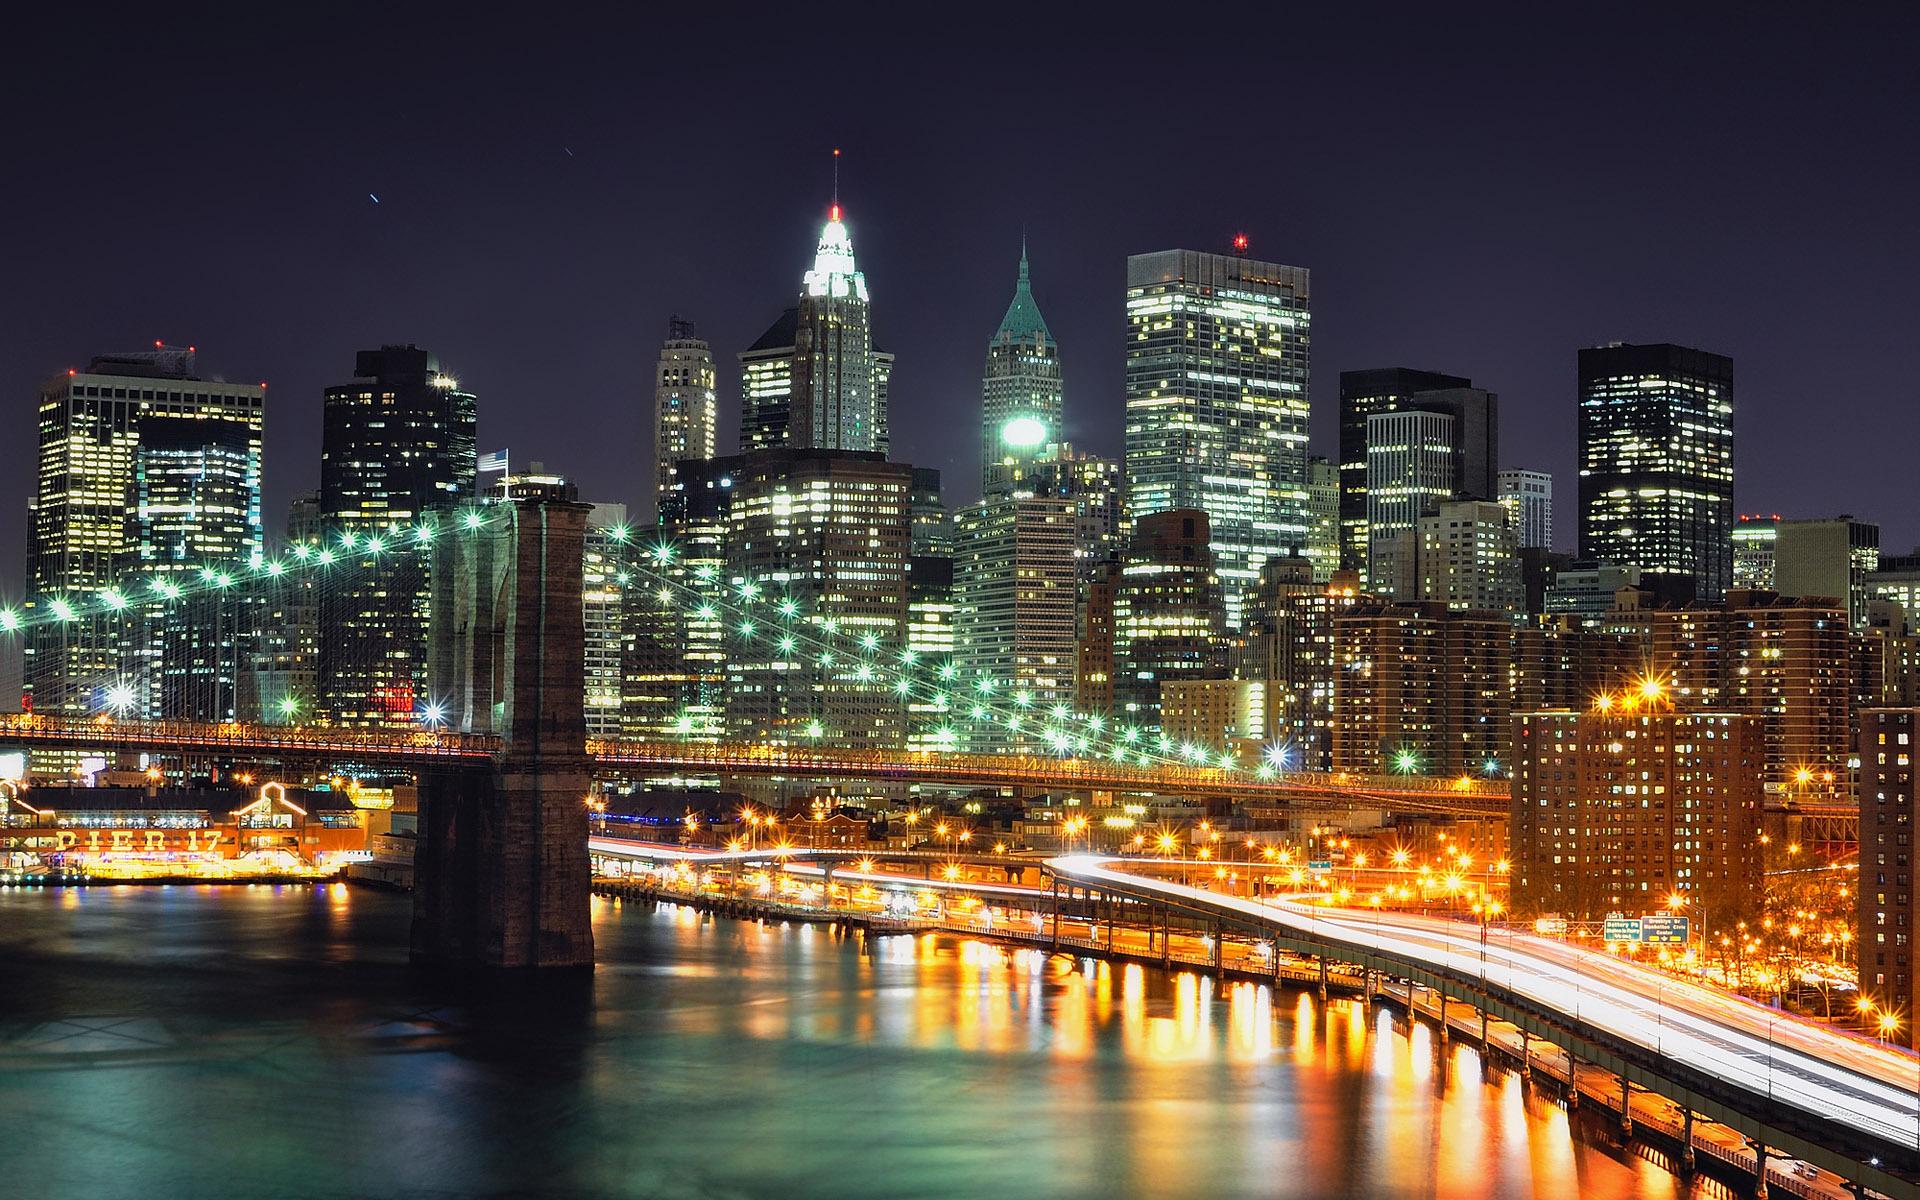 New York at night wallpaper 17337 1920x1200